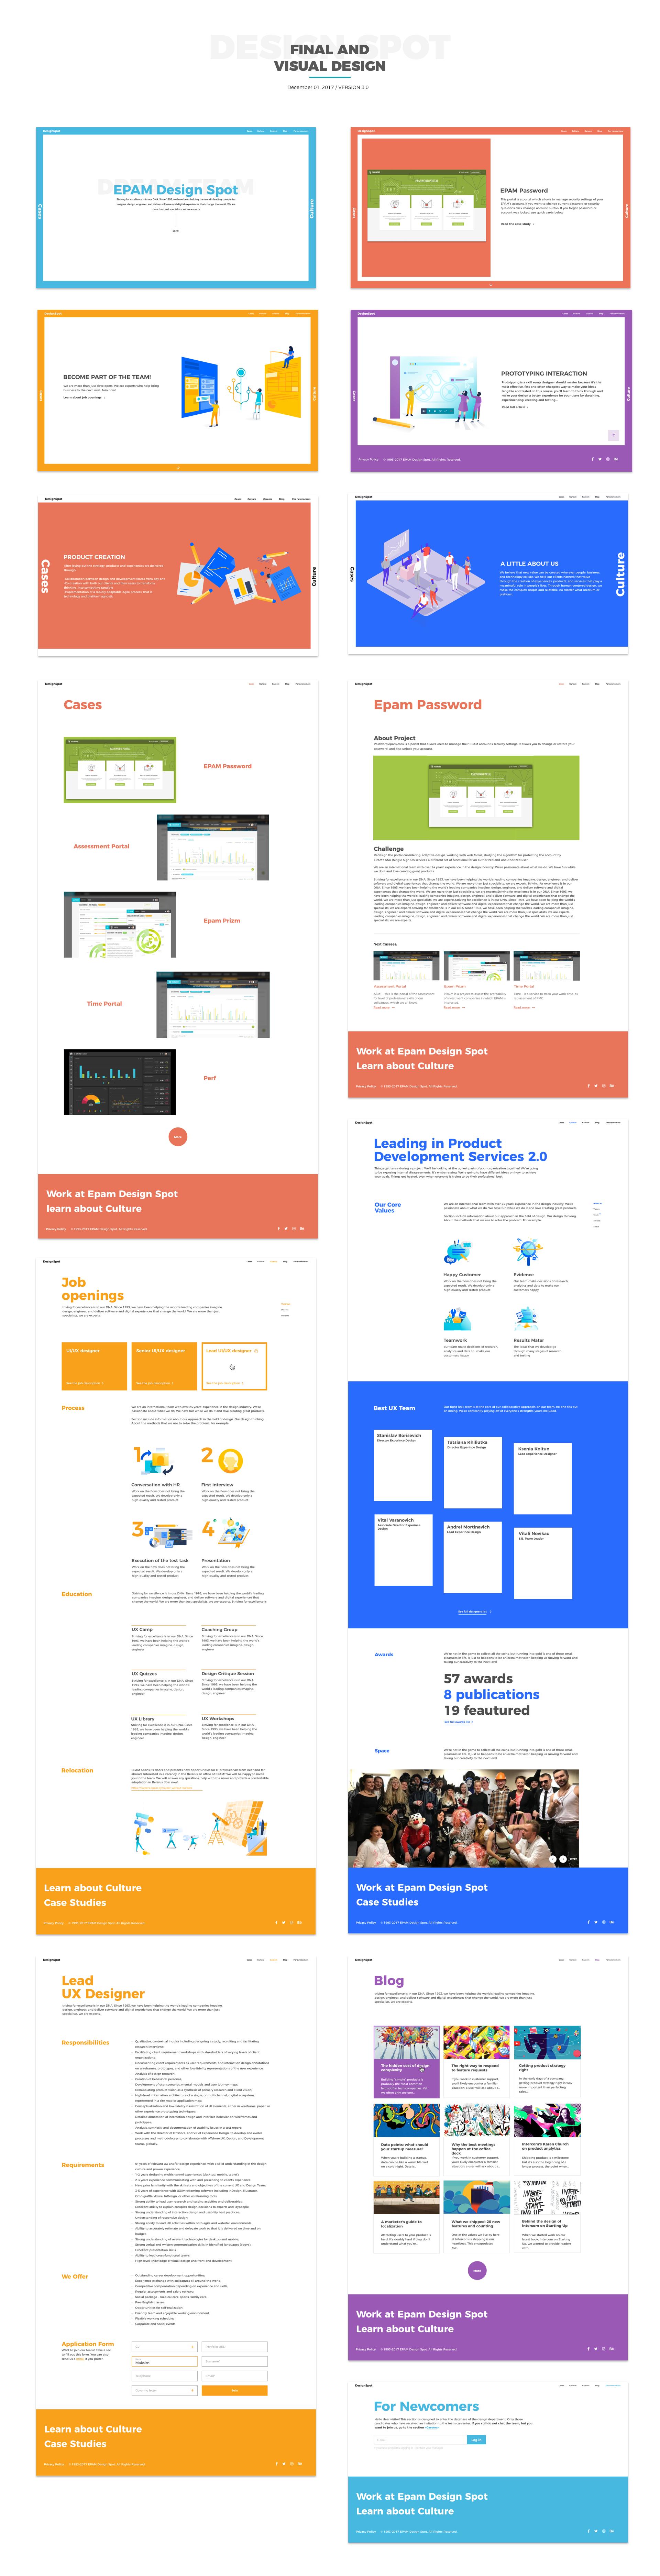 Design Spot  UX Process on Behance